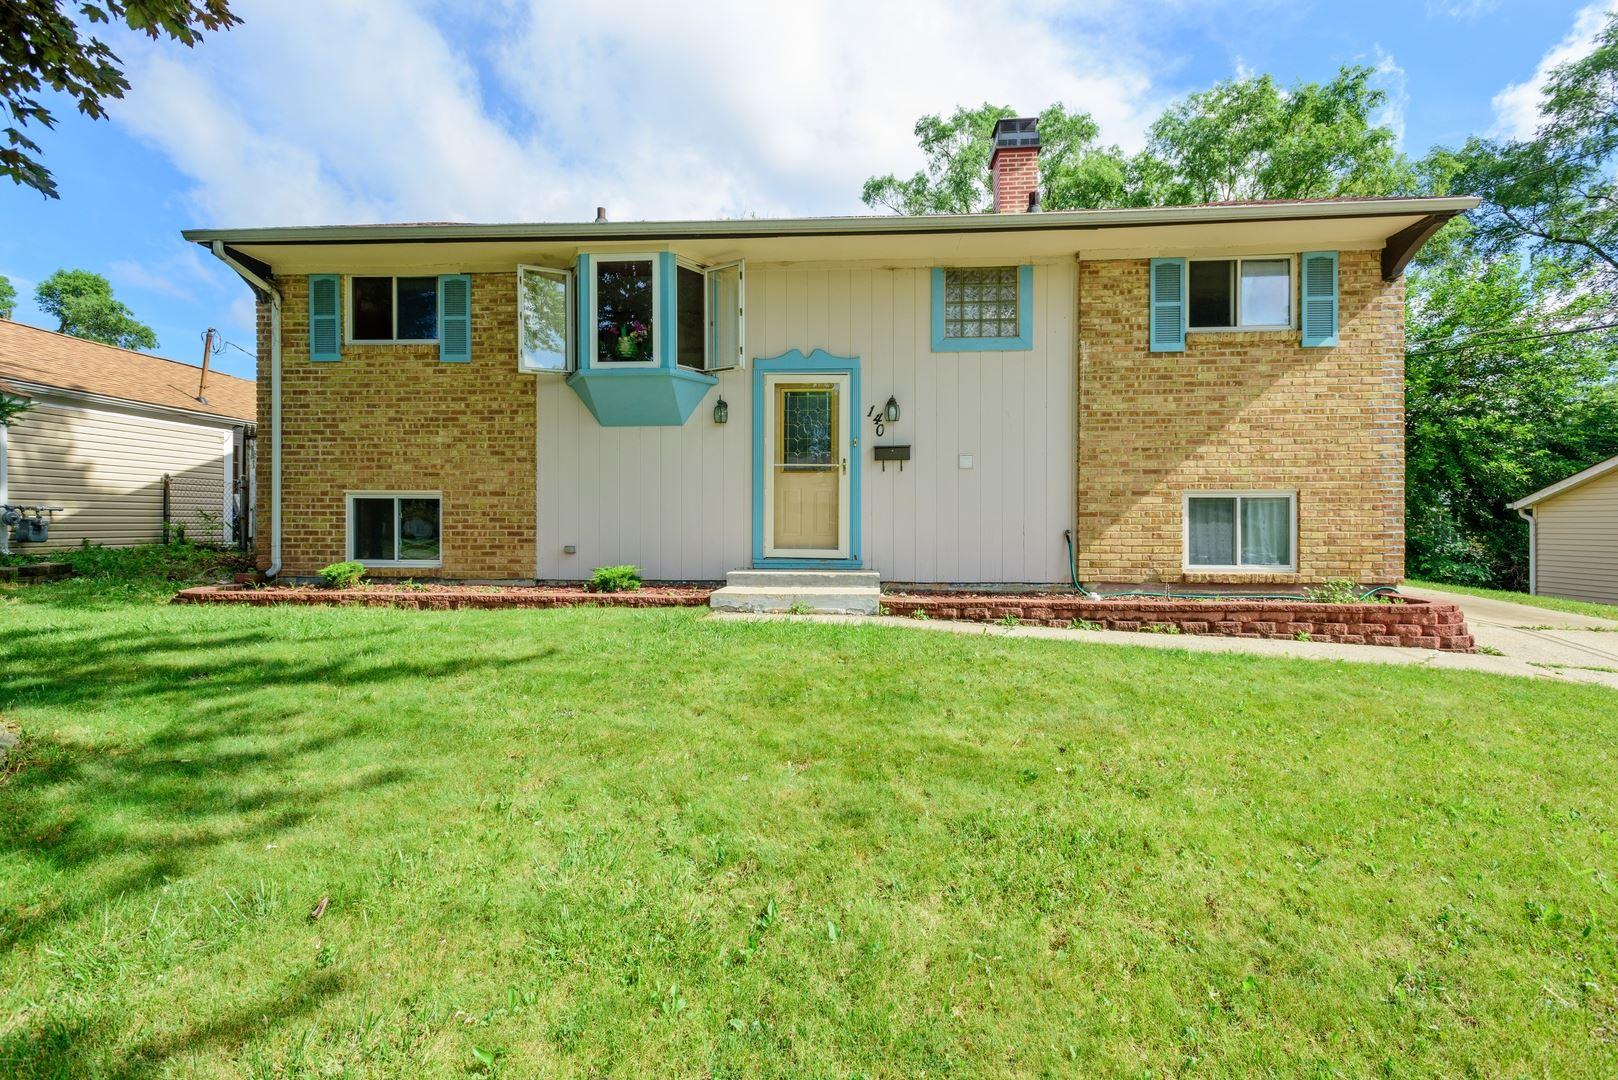 140 WINDSOR Lane, Glendale Heights, IL 60139 - #: 10758999